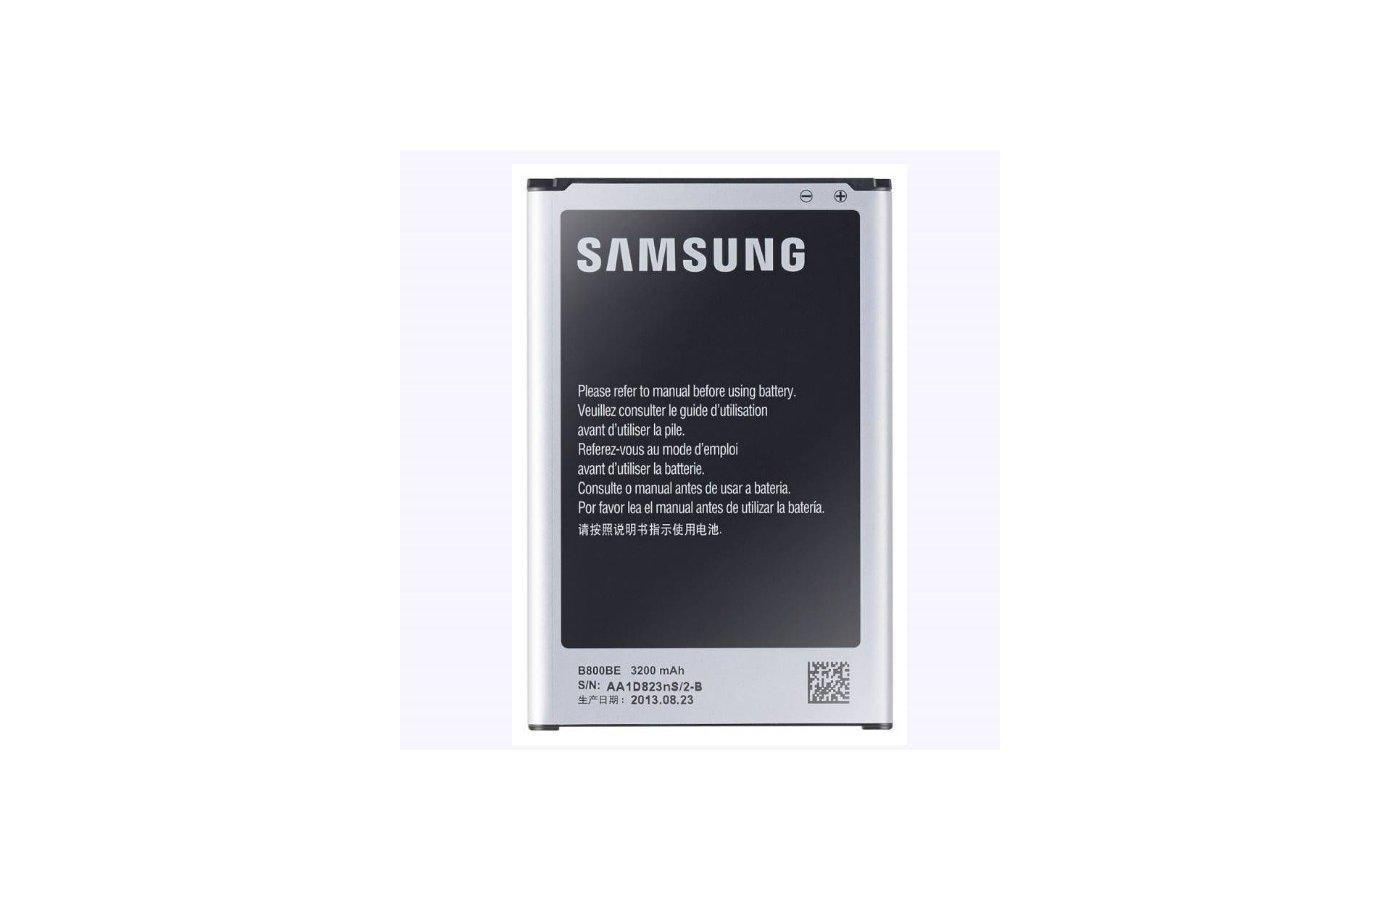 Аккумулятор Partner для Samsung B800BS/BE 3000mAh (ПР037524)